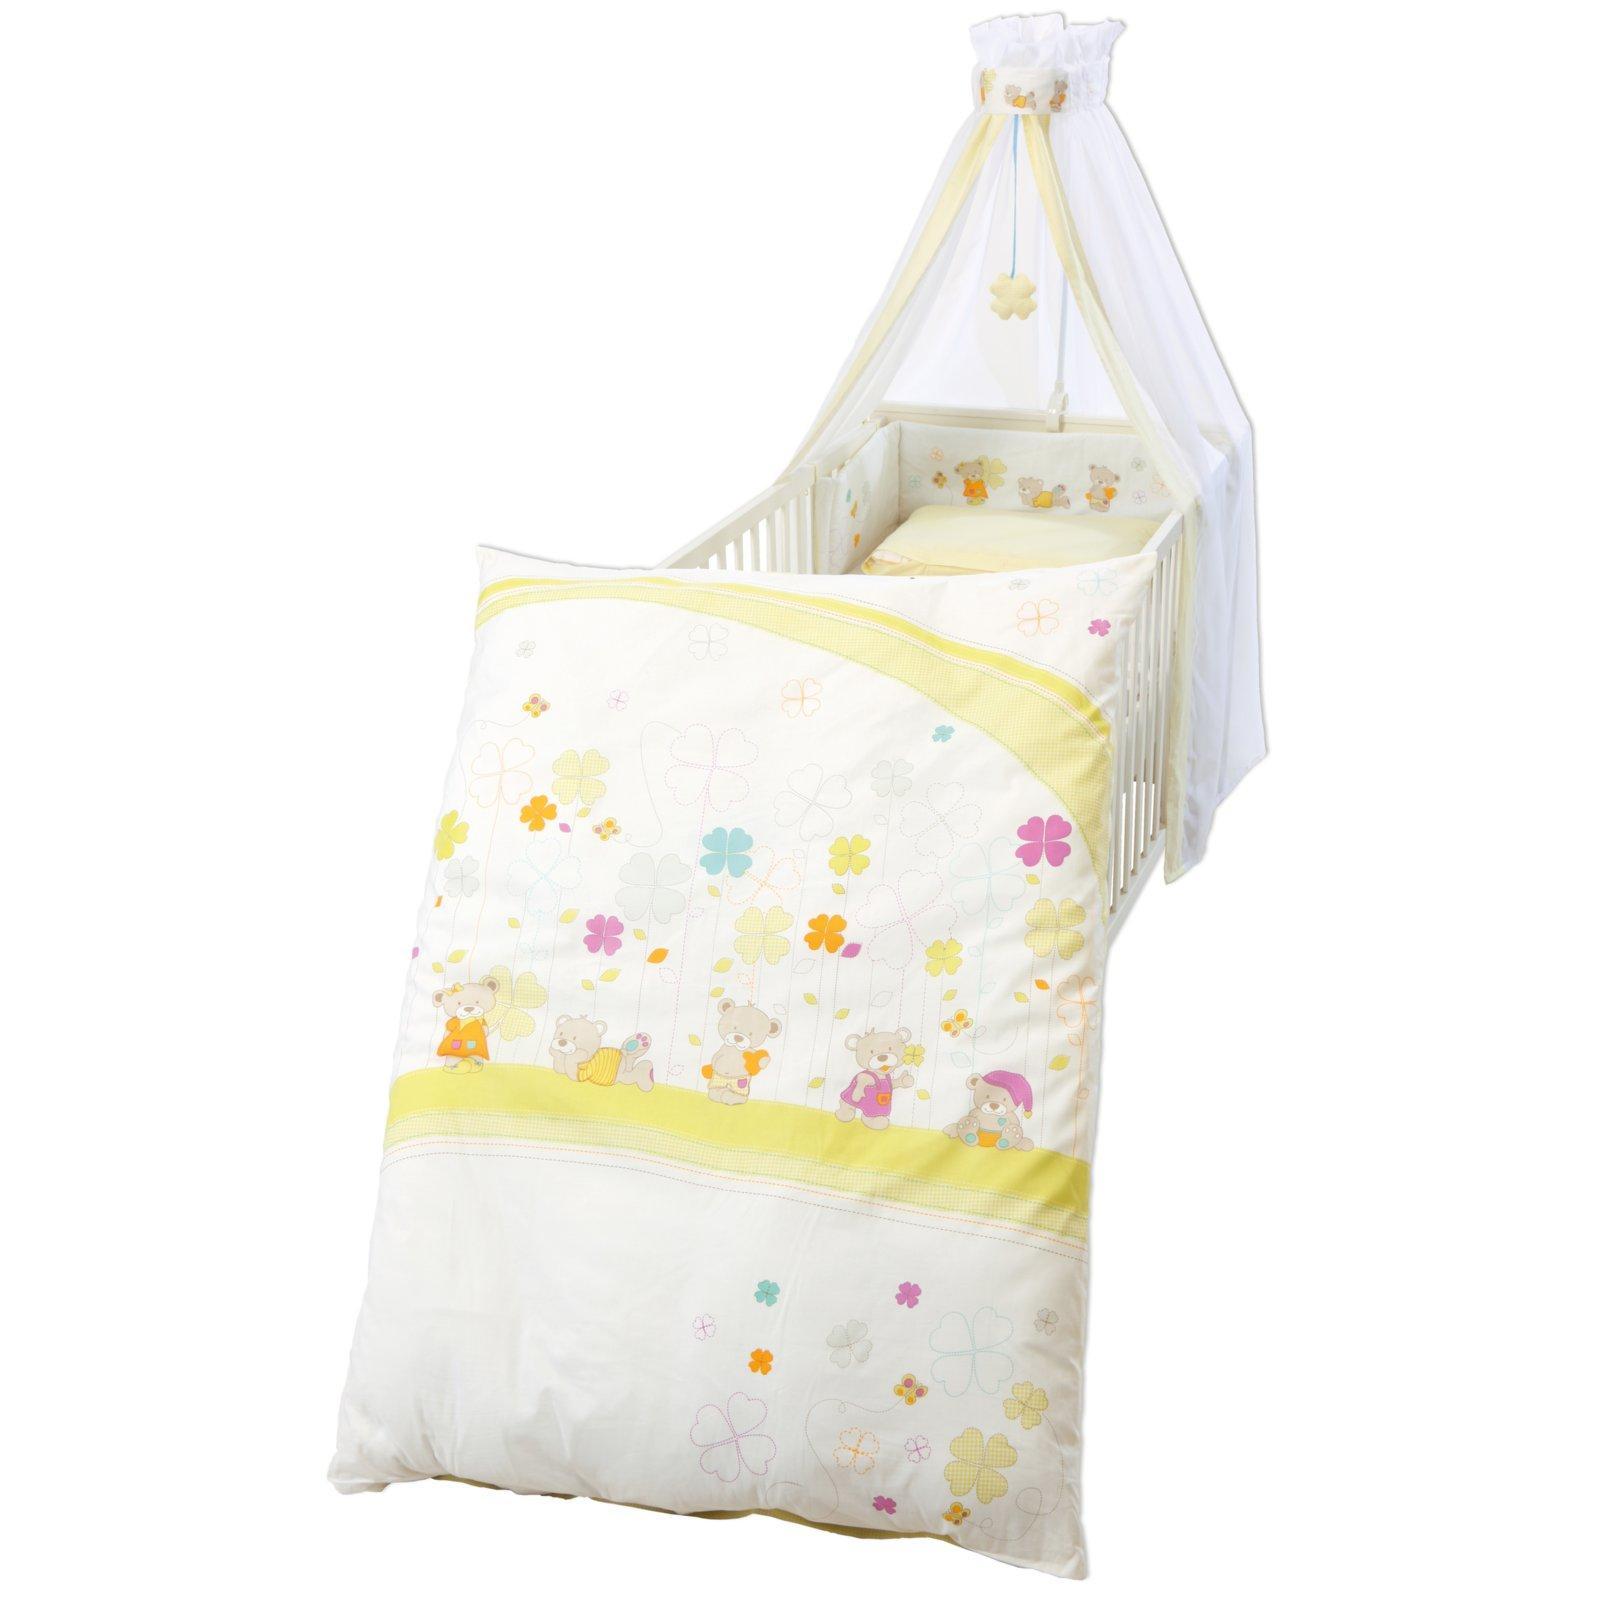 Kinderbettgarnitur wei gelb 4 teilig for Accessoires kinderzimmer